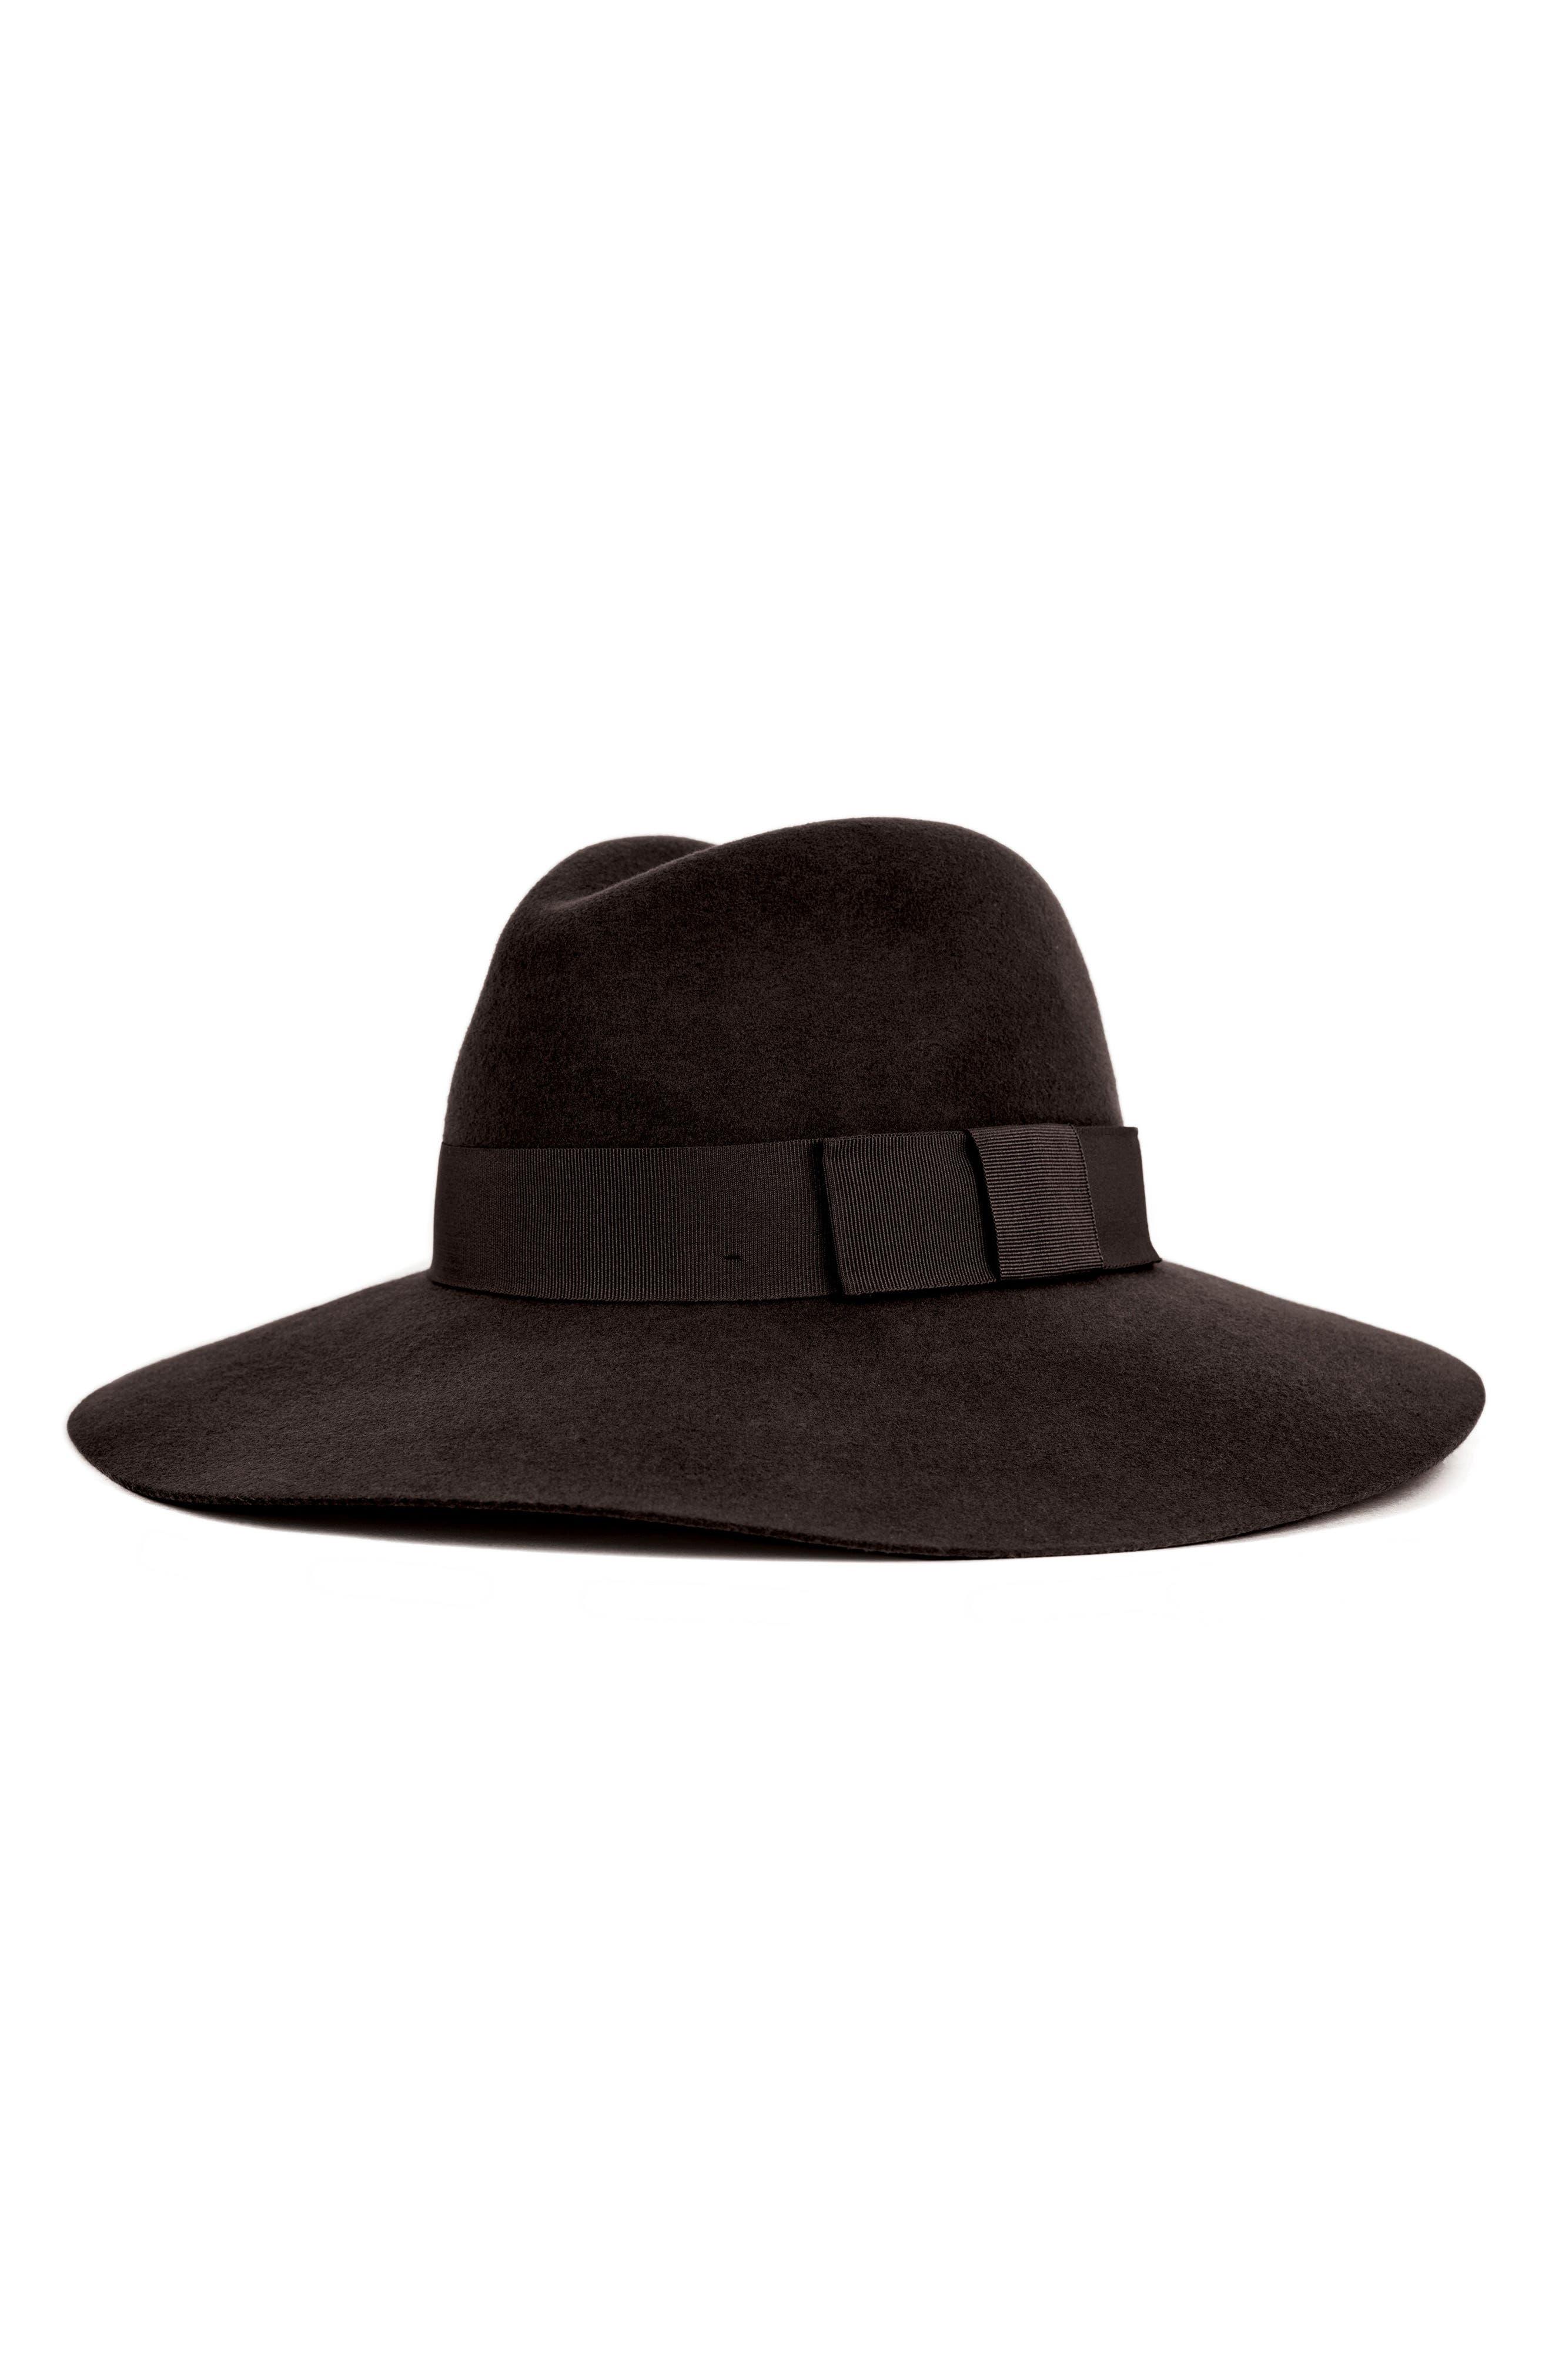 ... reduced brixton piper floppy wool hat black in black black a528c 1da77  ... 16bb49015aac